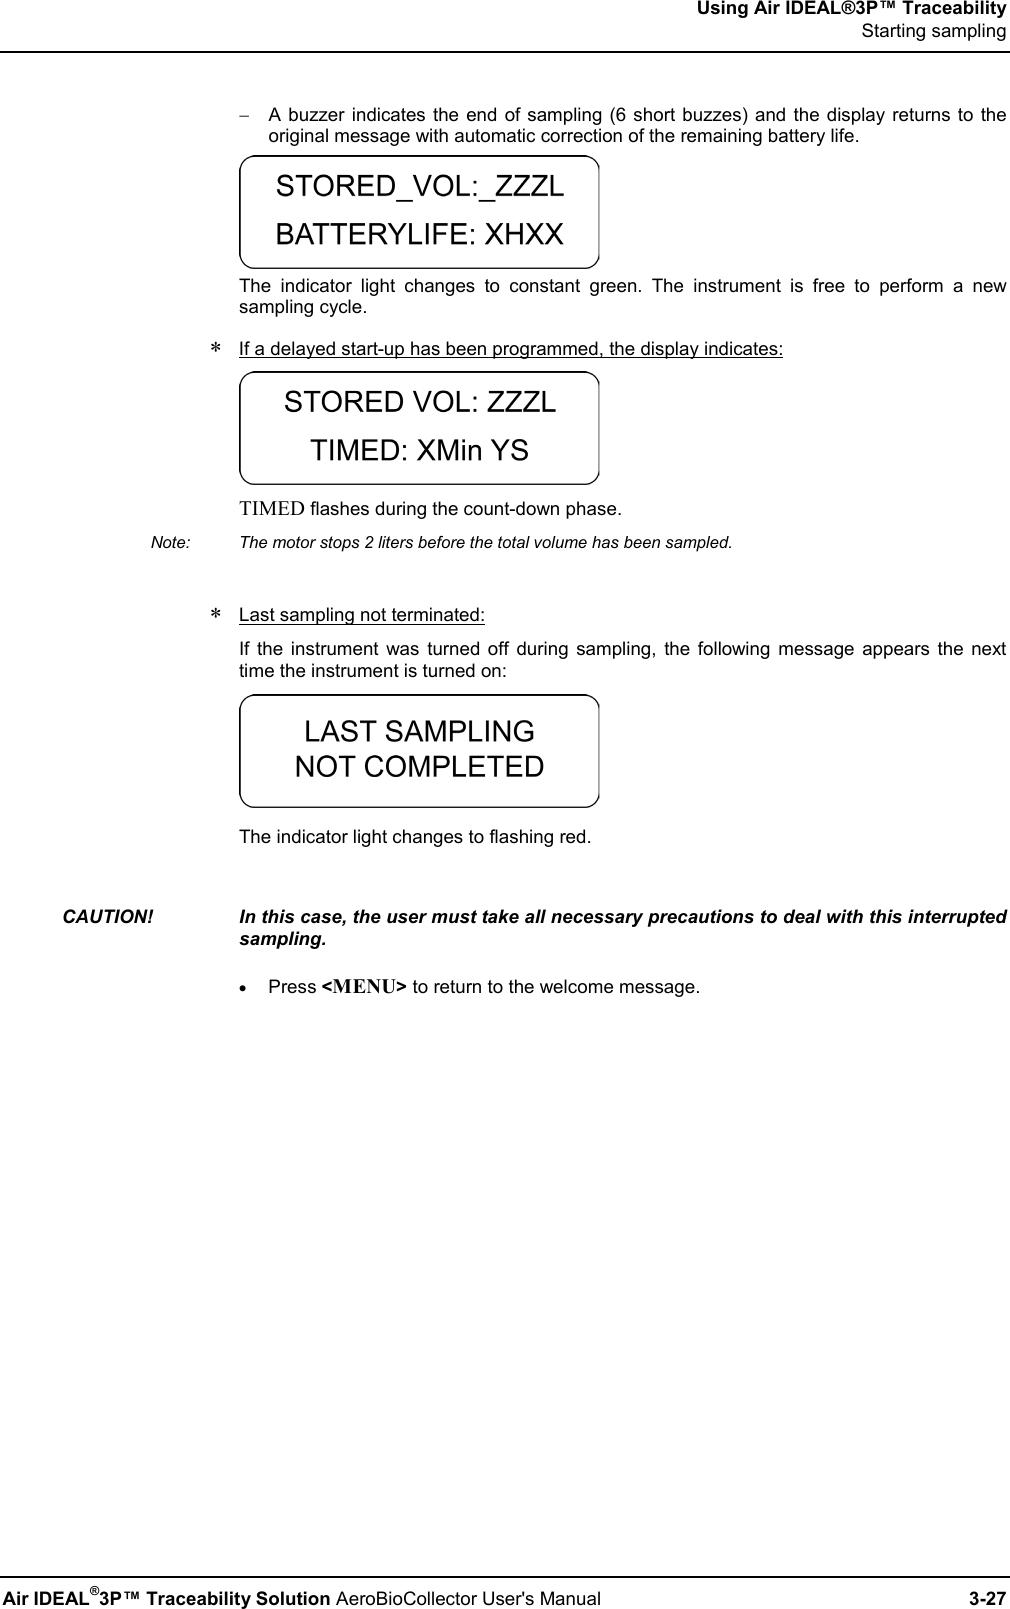 Lcb ai3ptra1 digital device user manual r f page 45 of lcb ai3ptra1 digital device user manual r f sciox Gallery